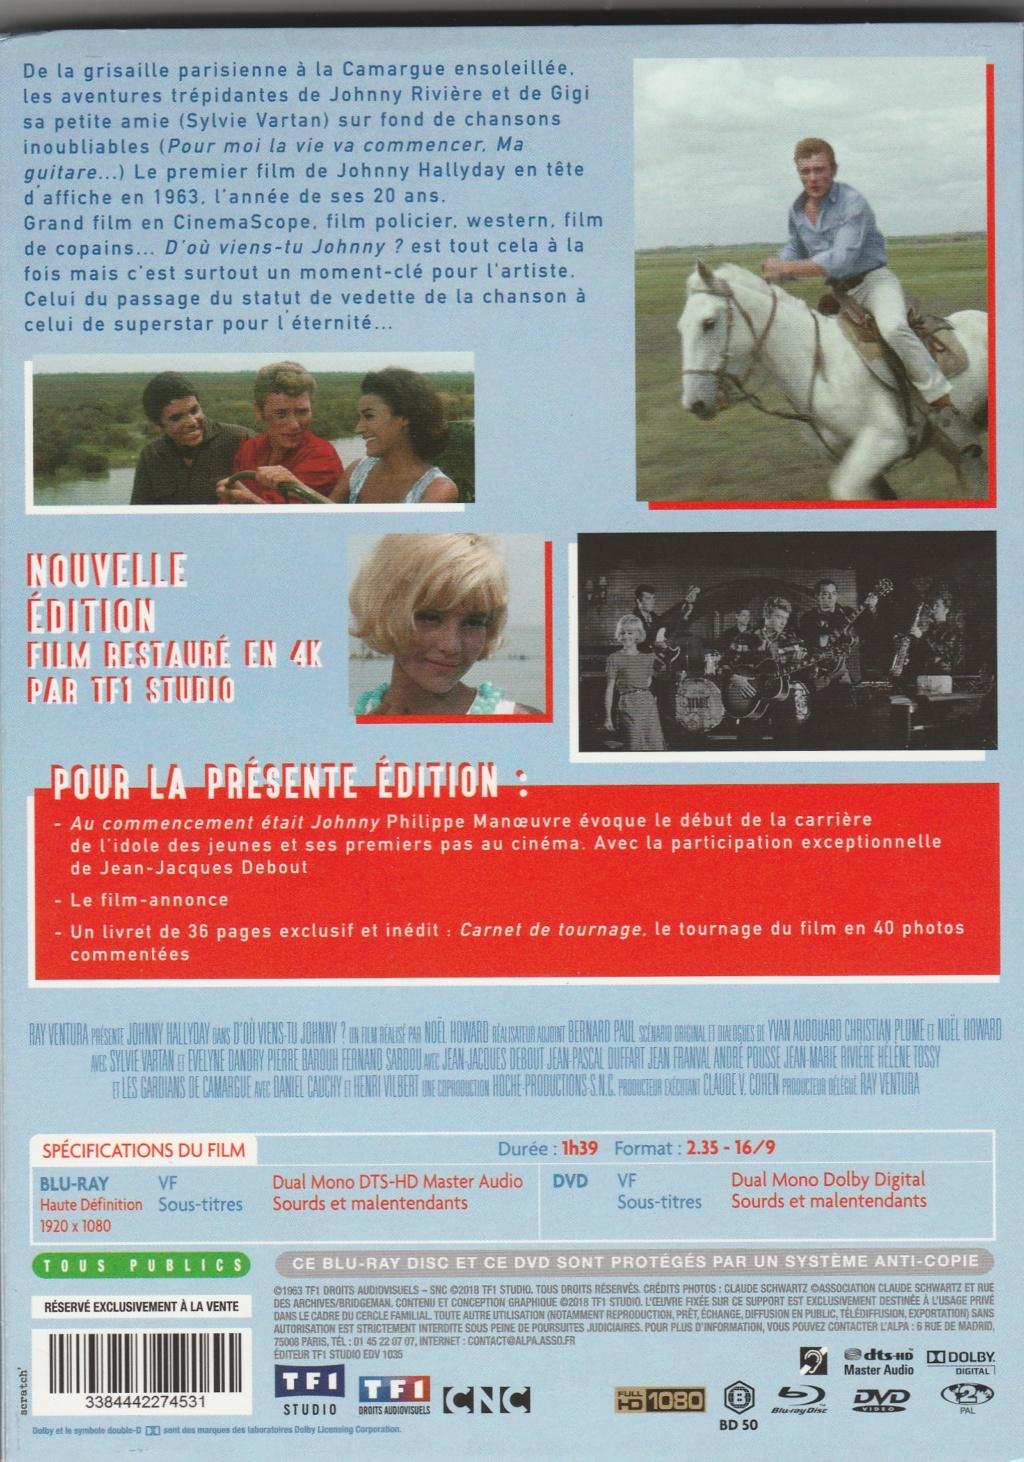 JAQUETTE DVD FILMS ( Jaquette + Sticker ) - Page 2 Img_2562